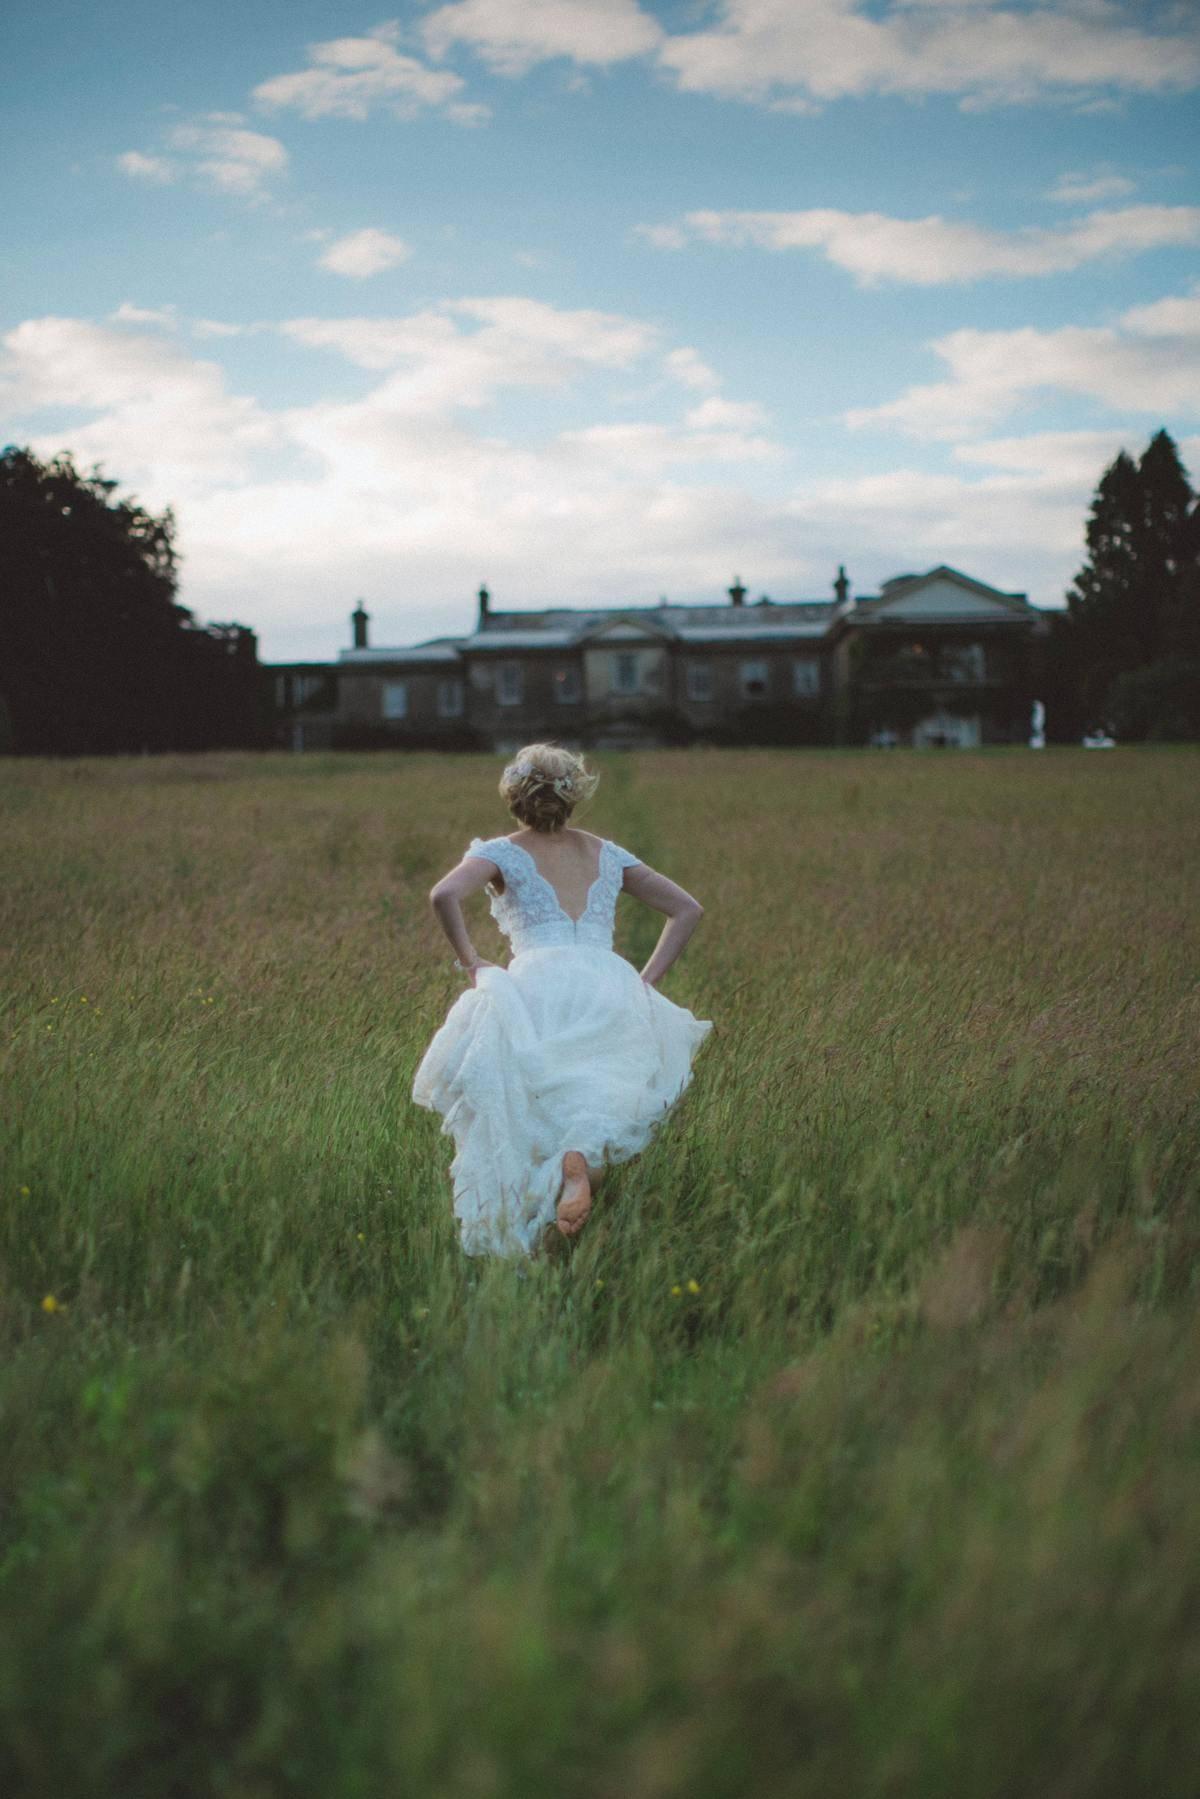 bride running in field barefoot